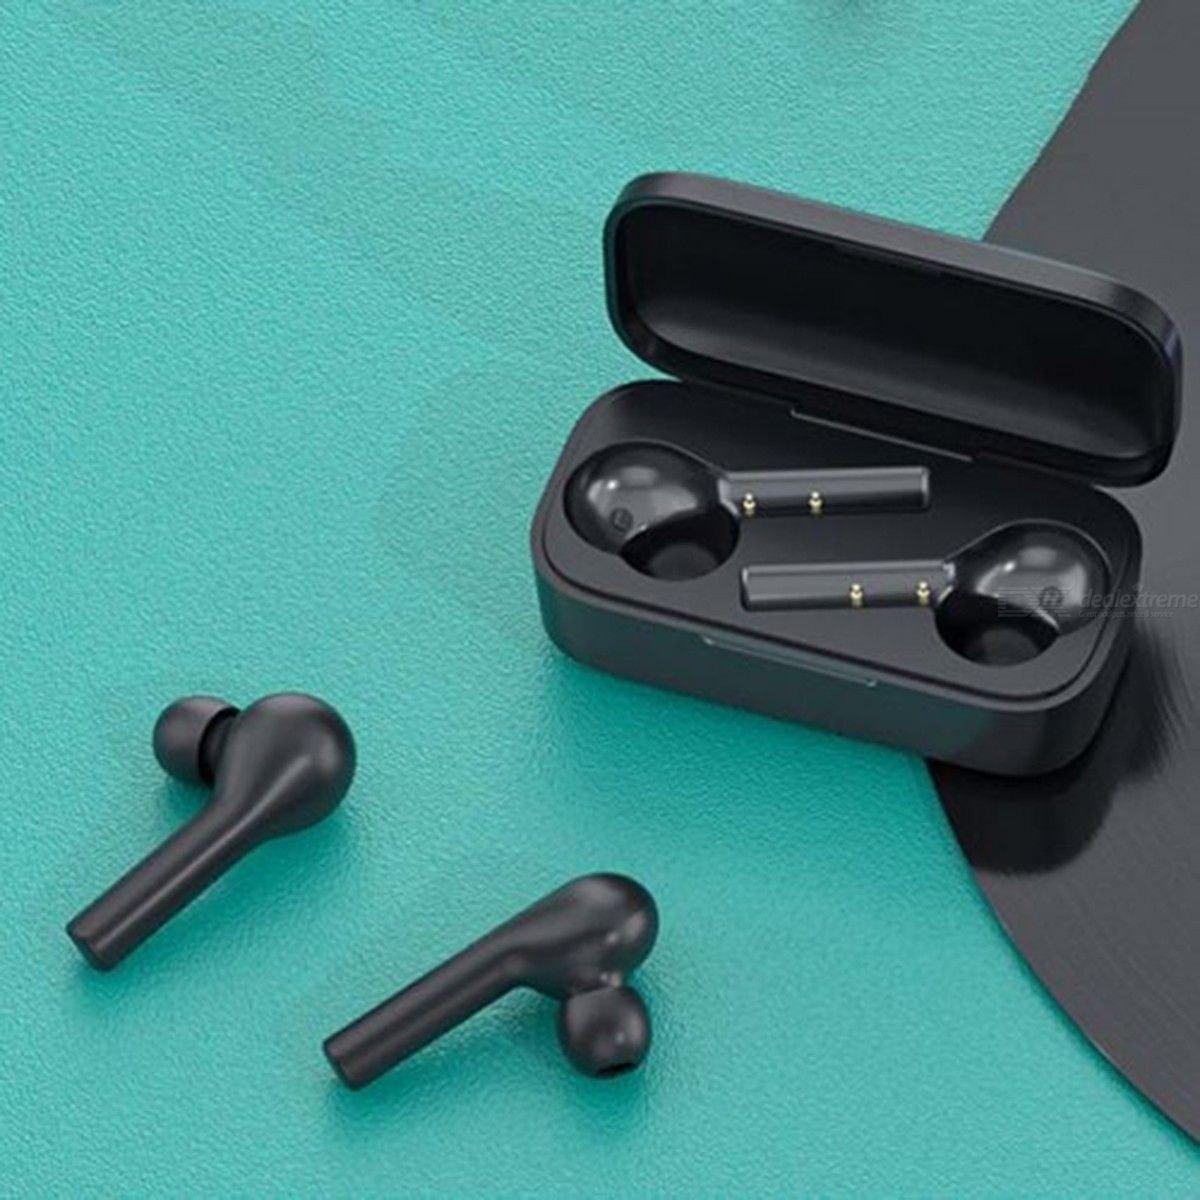 عکس هدفون بی سیم شیائومی مدل کیو سی وای T5 Xiaomi QCY T5 Wireless Headphones هدفون-بی-سیم-شیایومی-مدل-کیو-سی-وای-t5